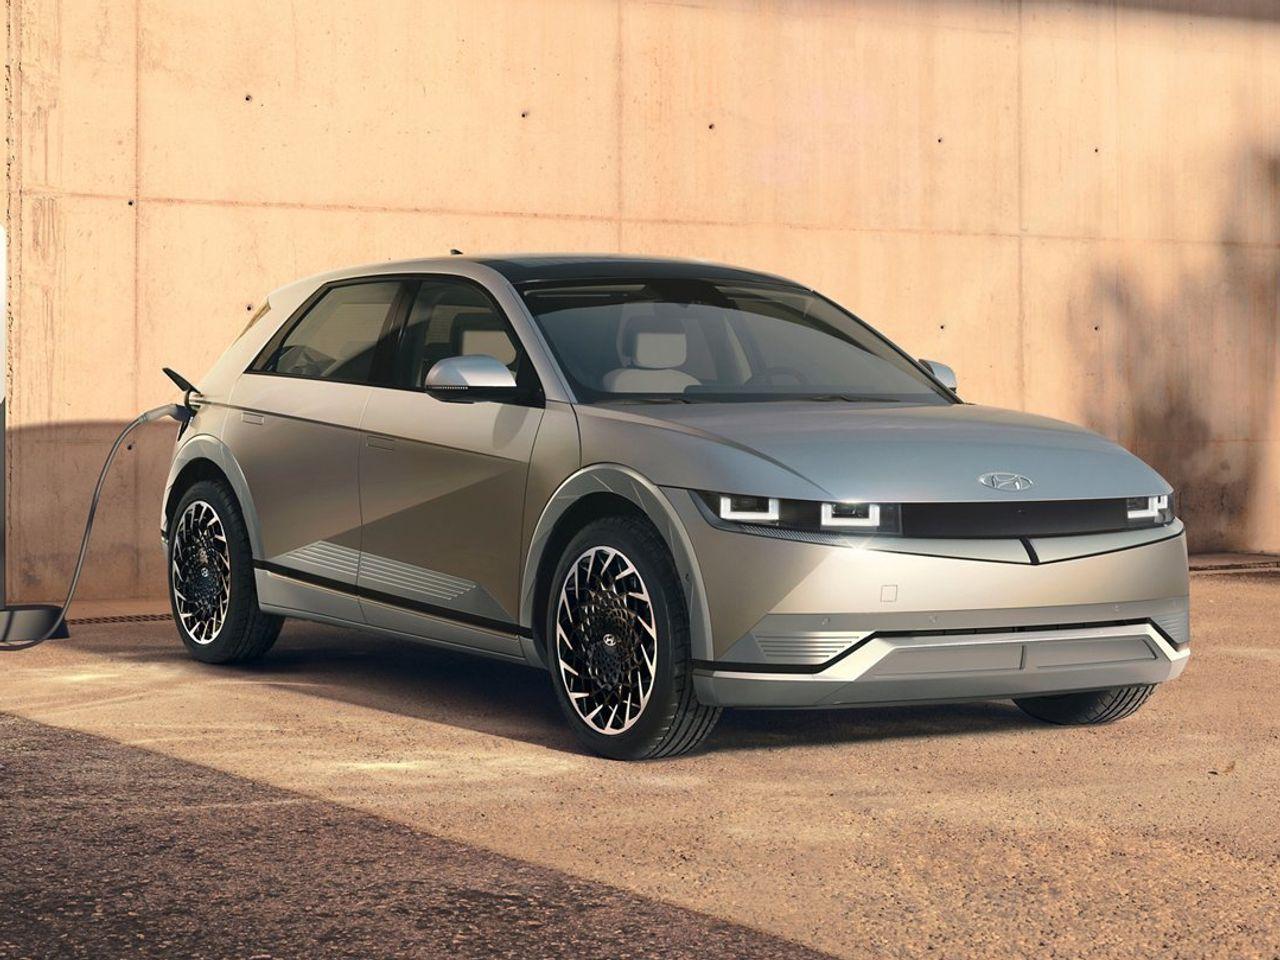 Ioniq 5, mẫu hathback 5 cửa thuần điện tại Mỹ. Ảnh: Hyundai